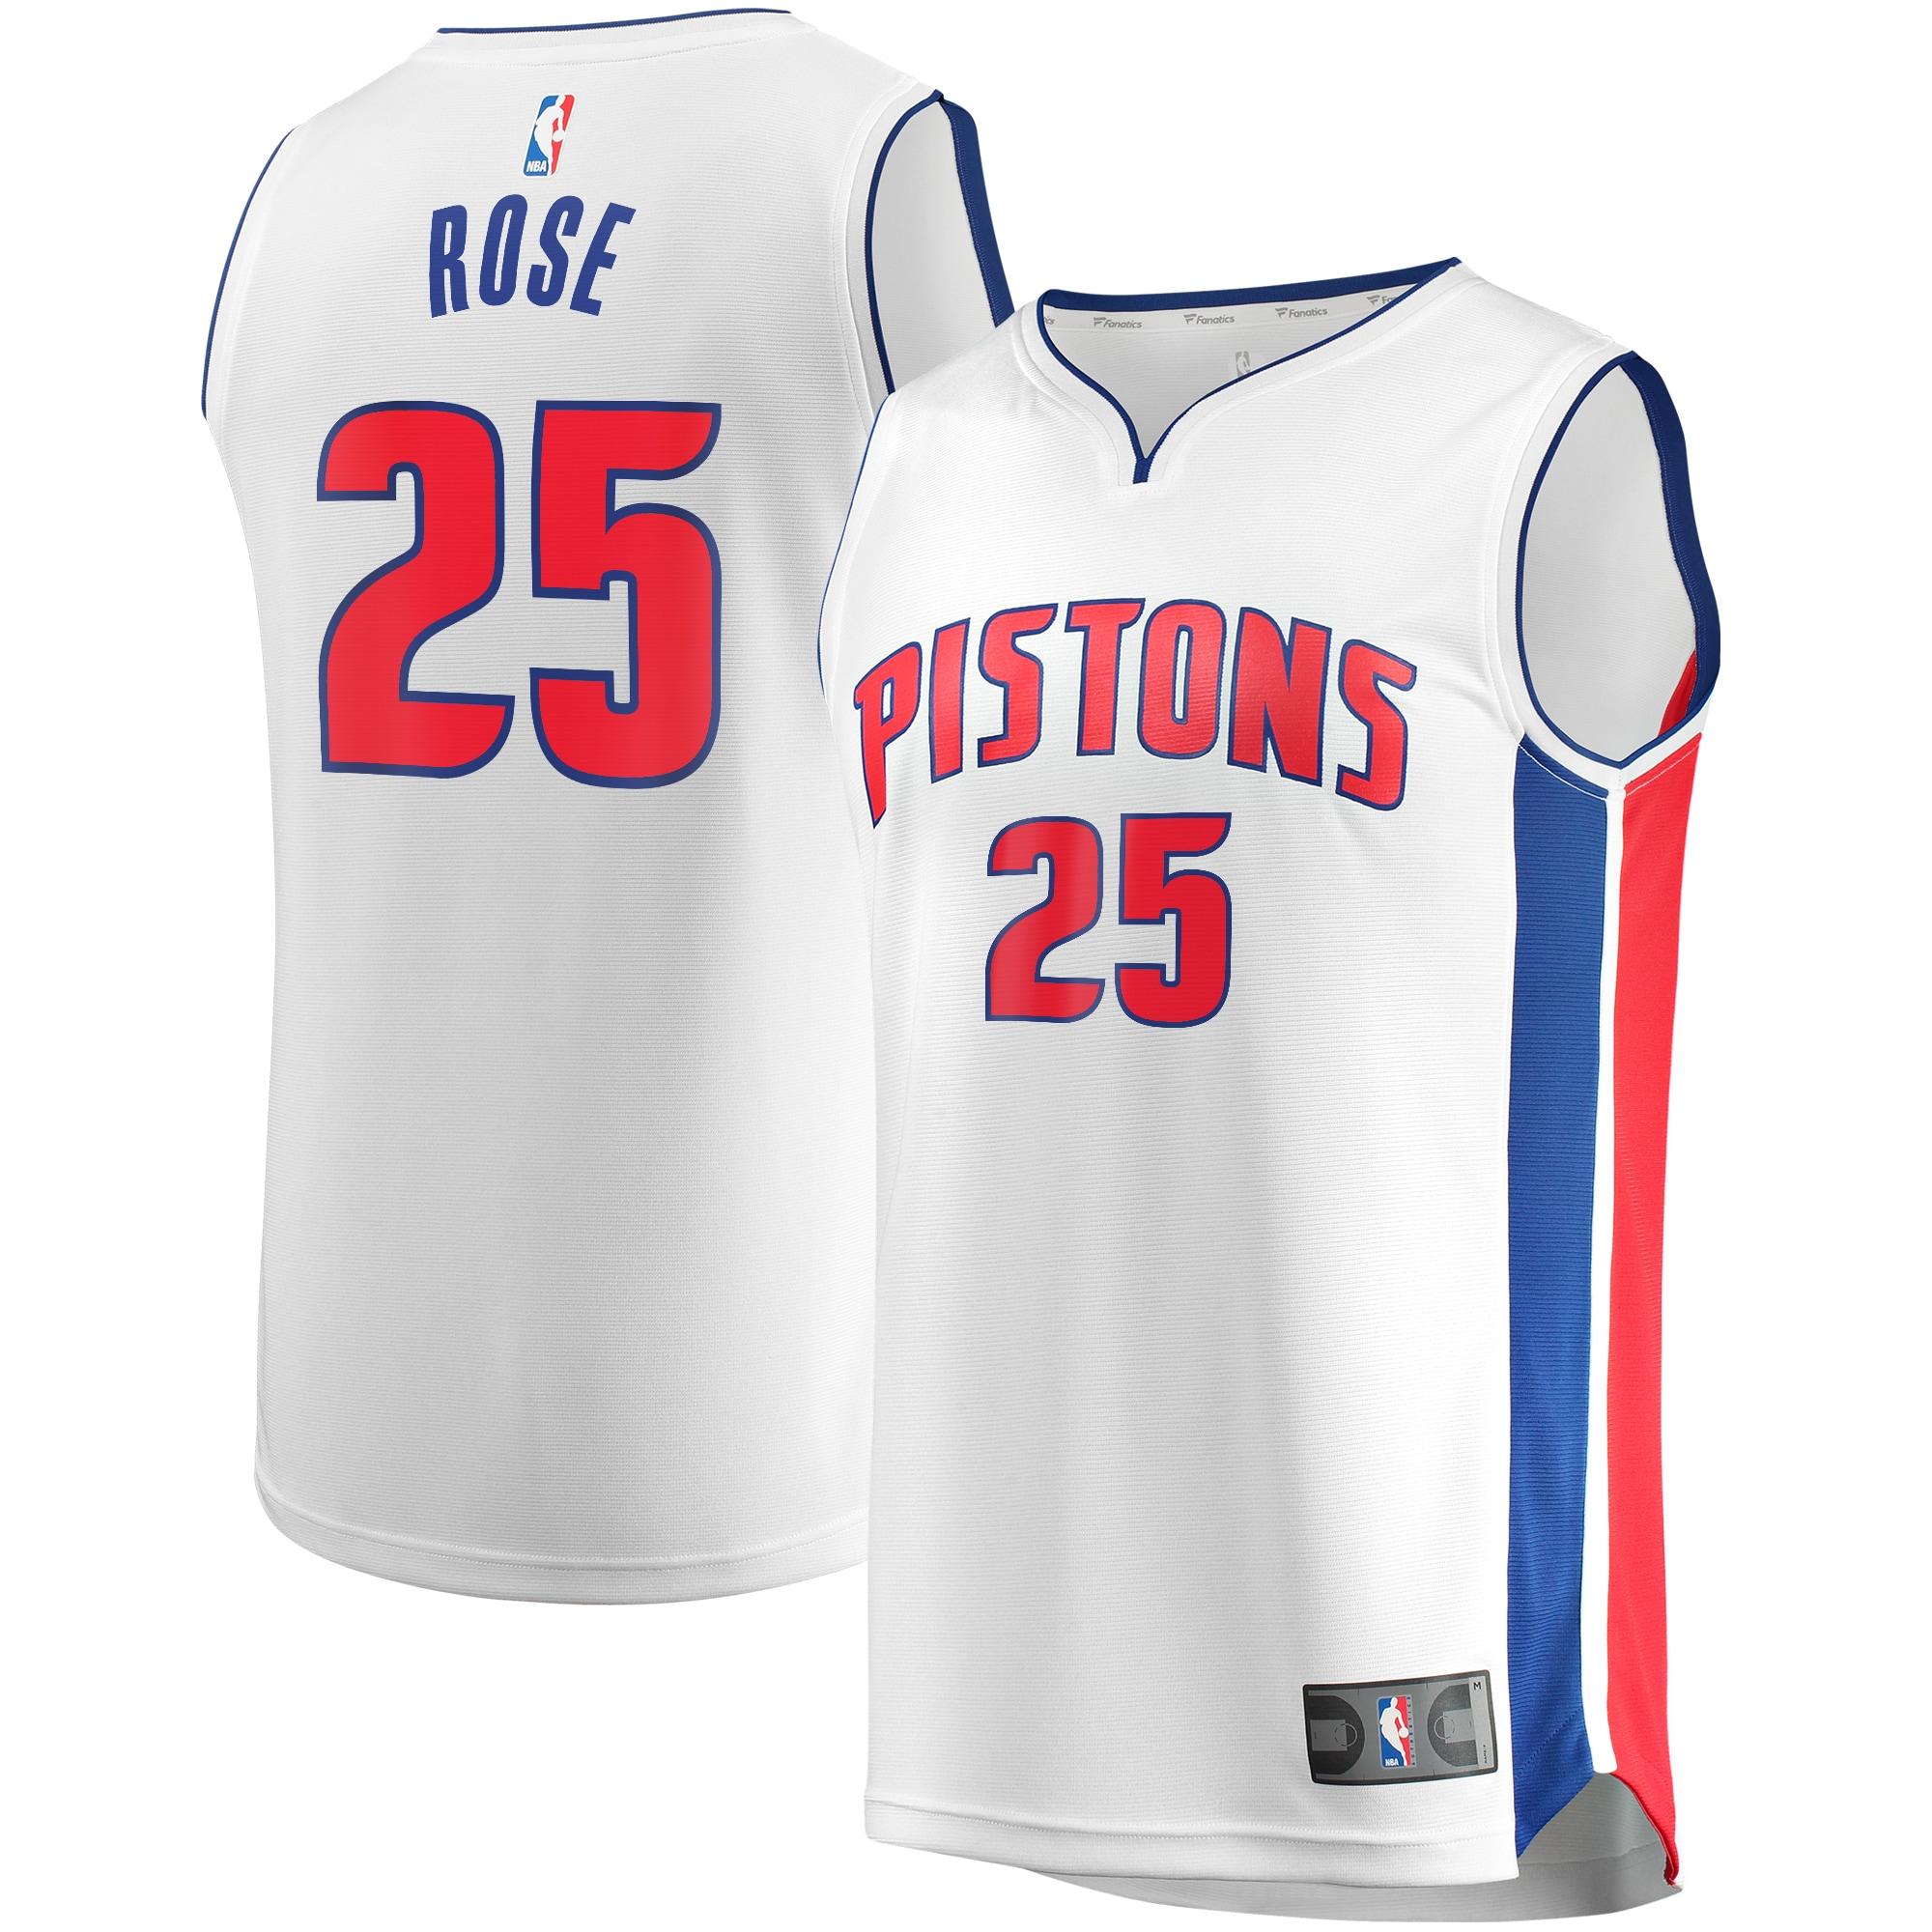 Derrick Rose Detroit Pistons Fanatics Branded Youth Fast Break Replica Player Jersey - Association Edition - White